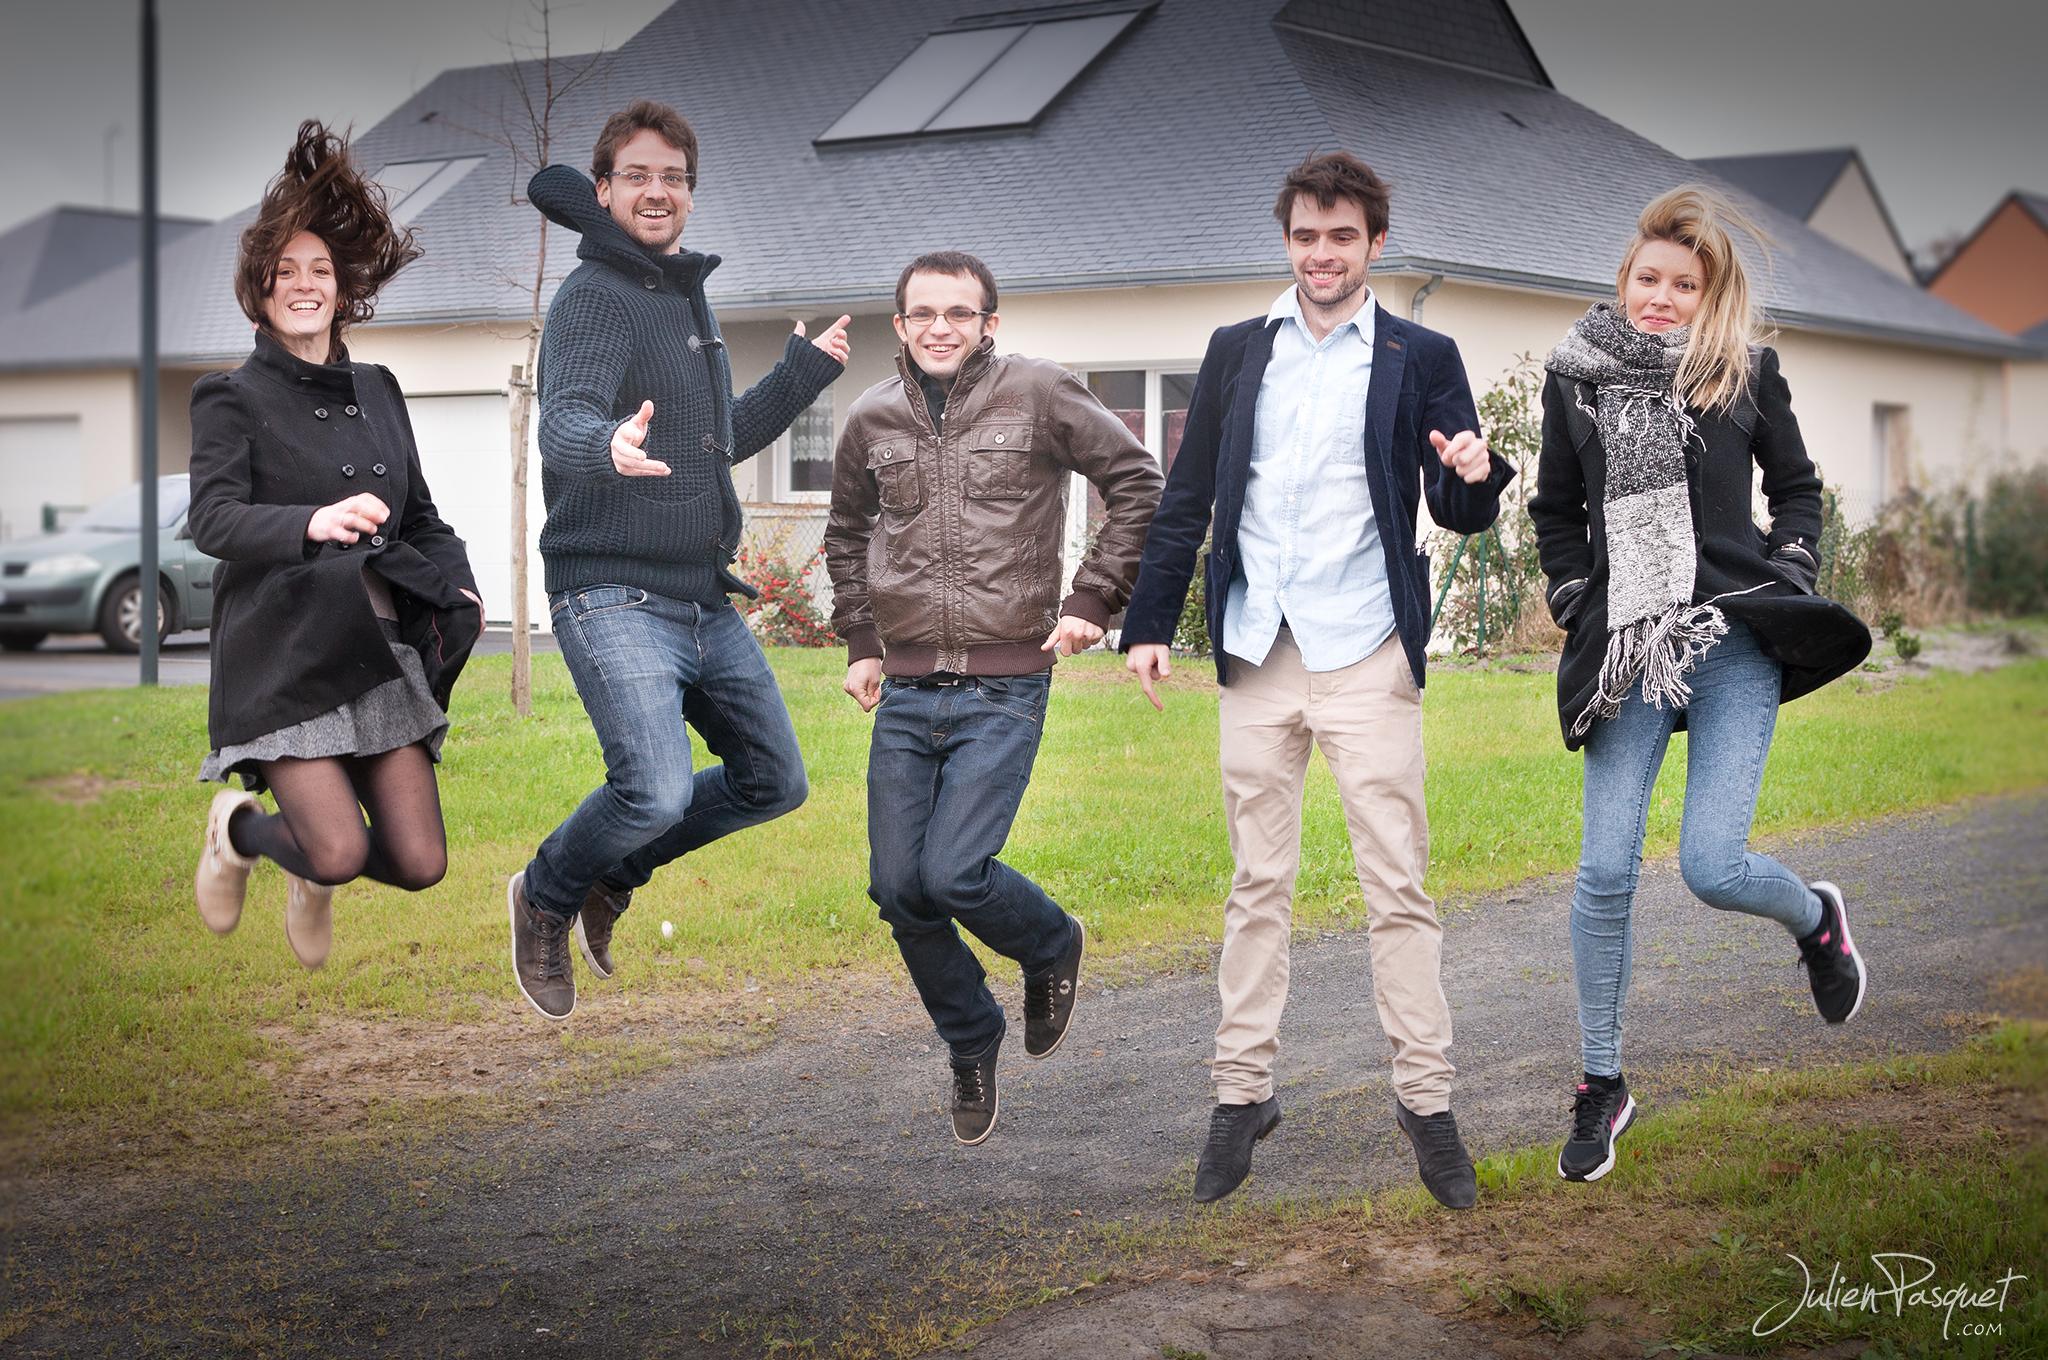 Elise, Luc, Camille, Simon, Thibaud